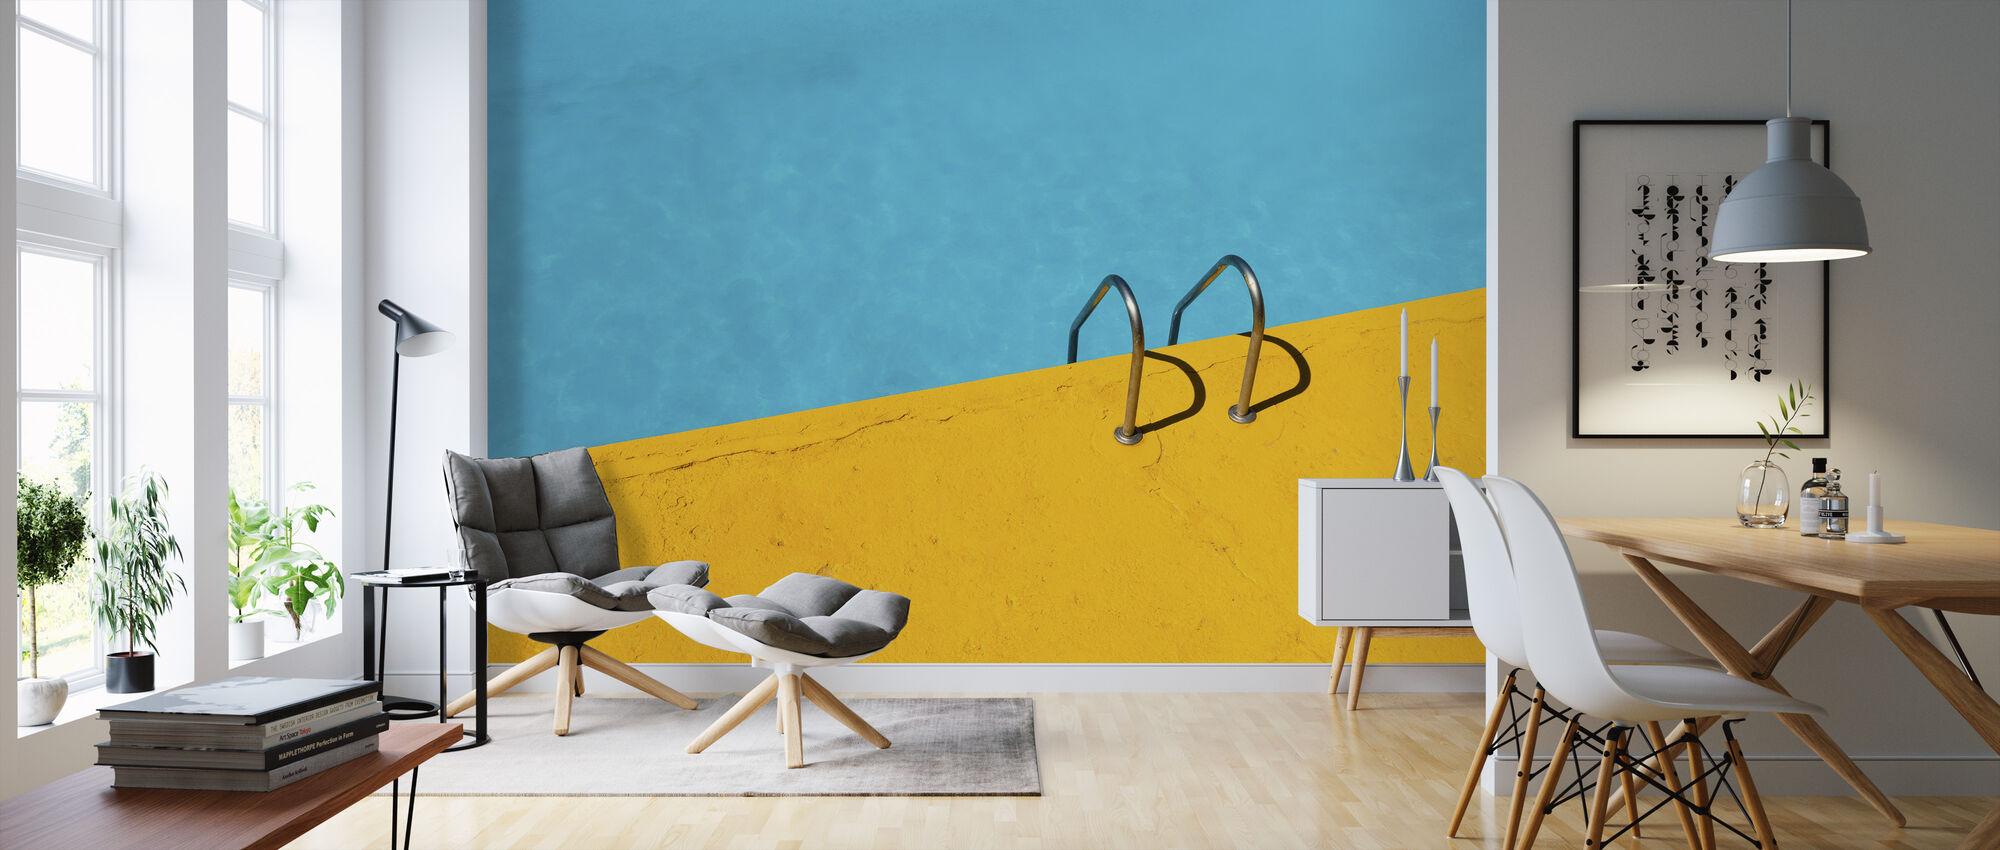 Swimming Pool Handrail - Wallpaper - Living Room